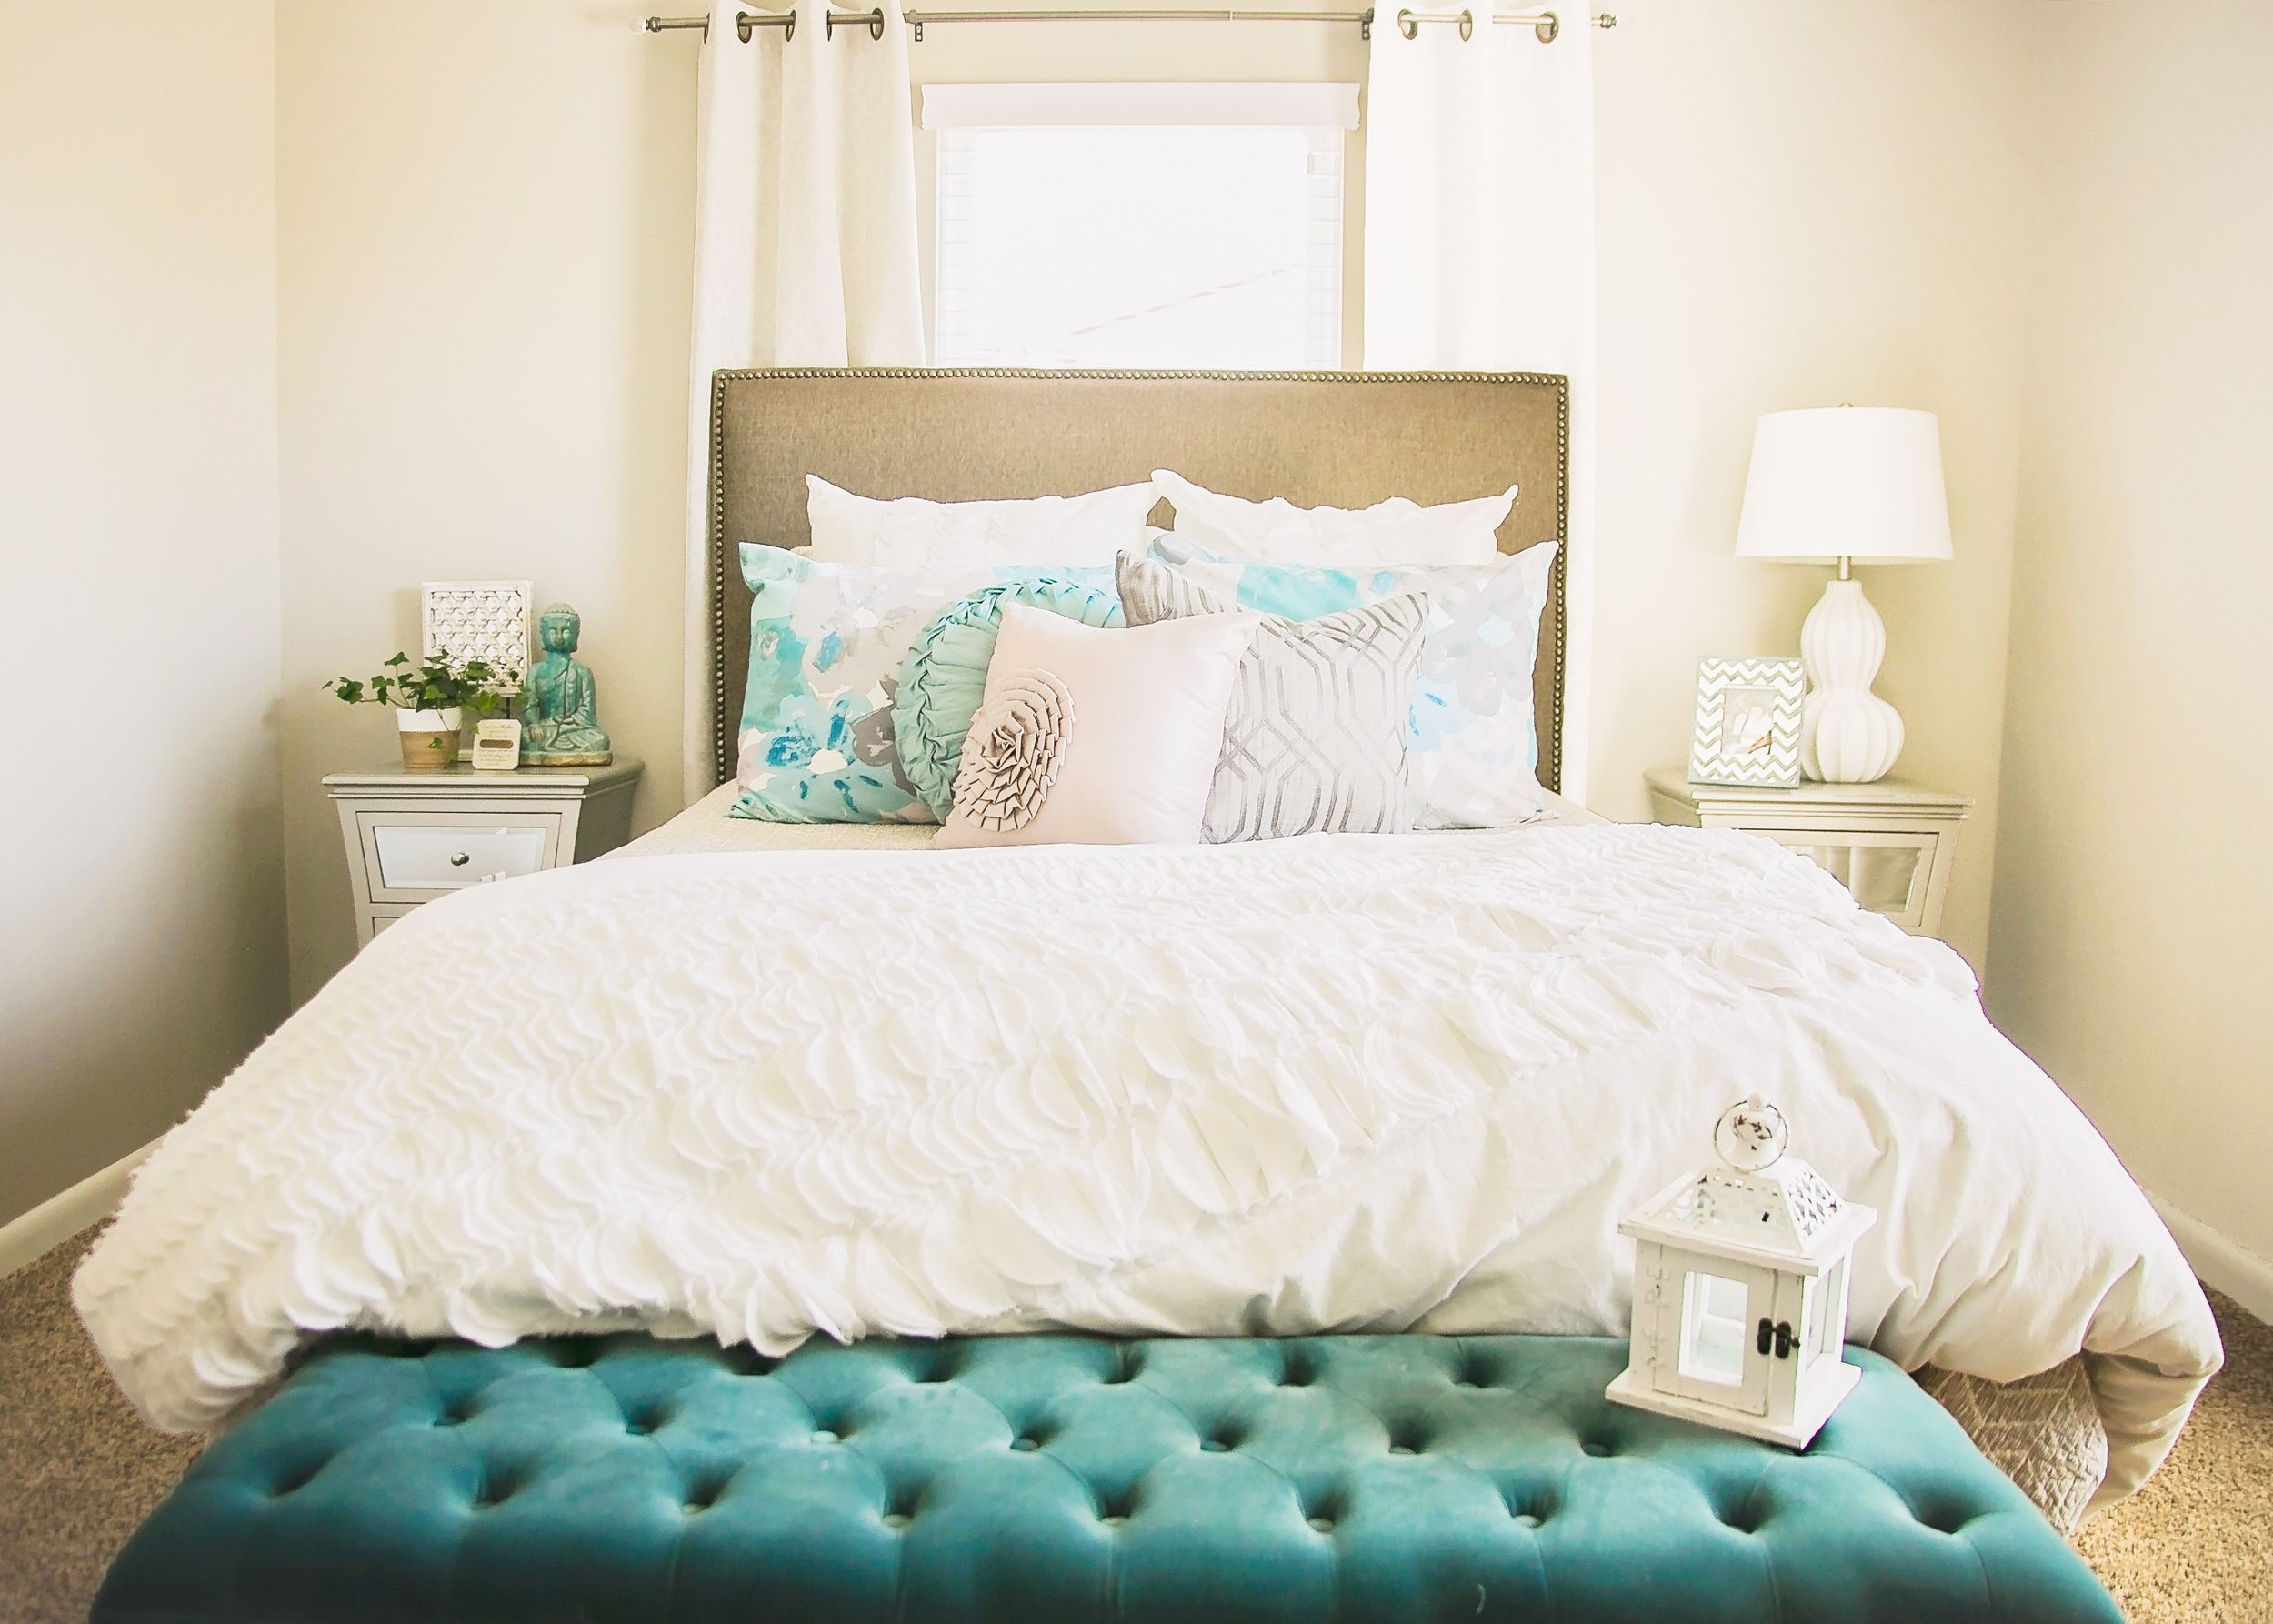 Pin by Lauren Corley on bedroom inspiration | Rearranging ...